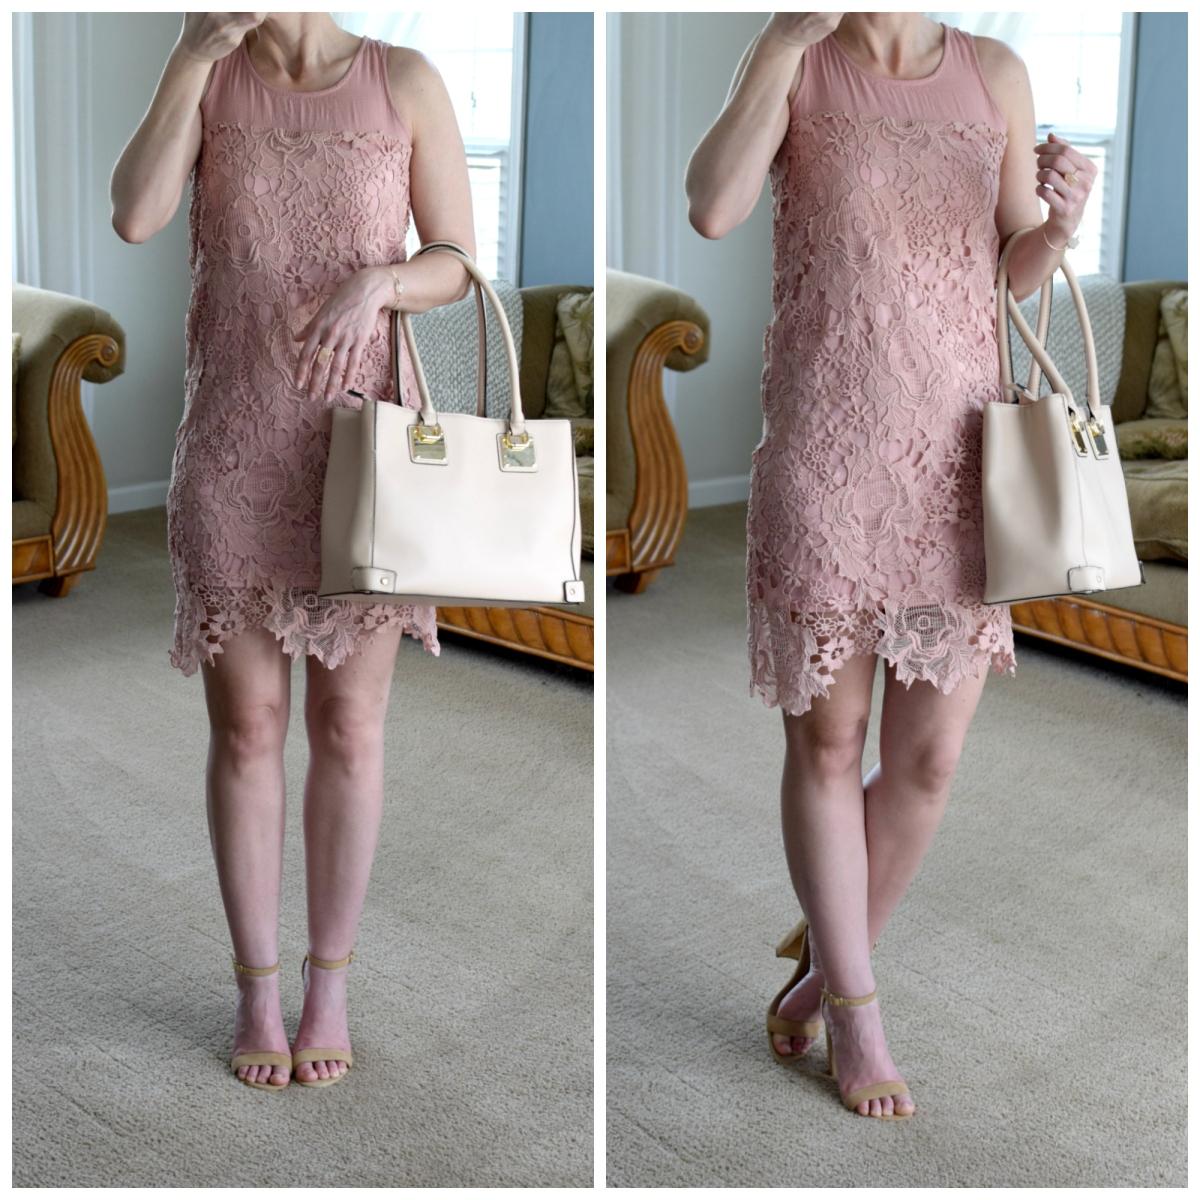 lace overlay dress |www.pearlsandsportsbras.com|